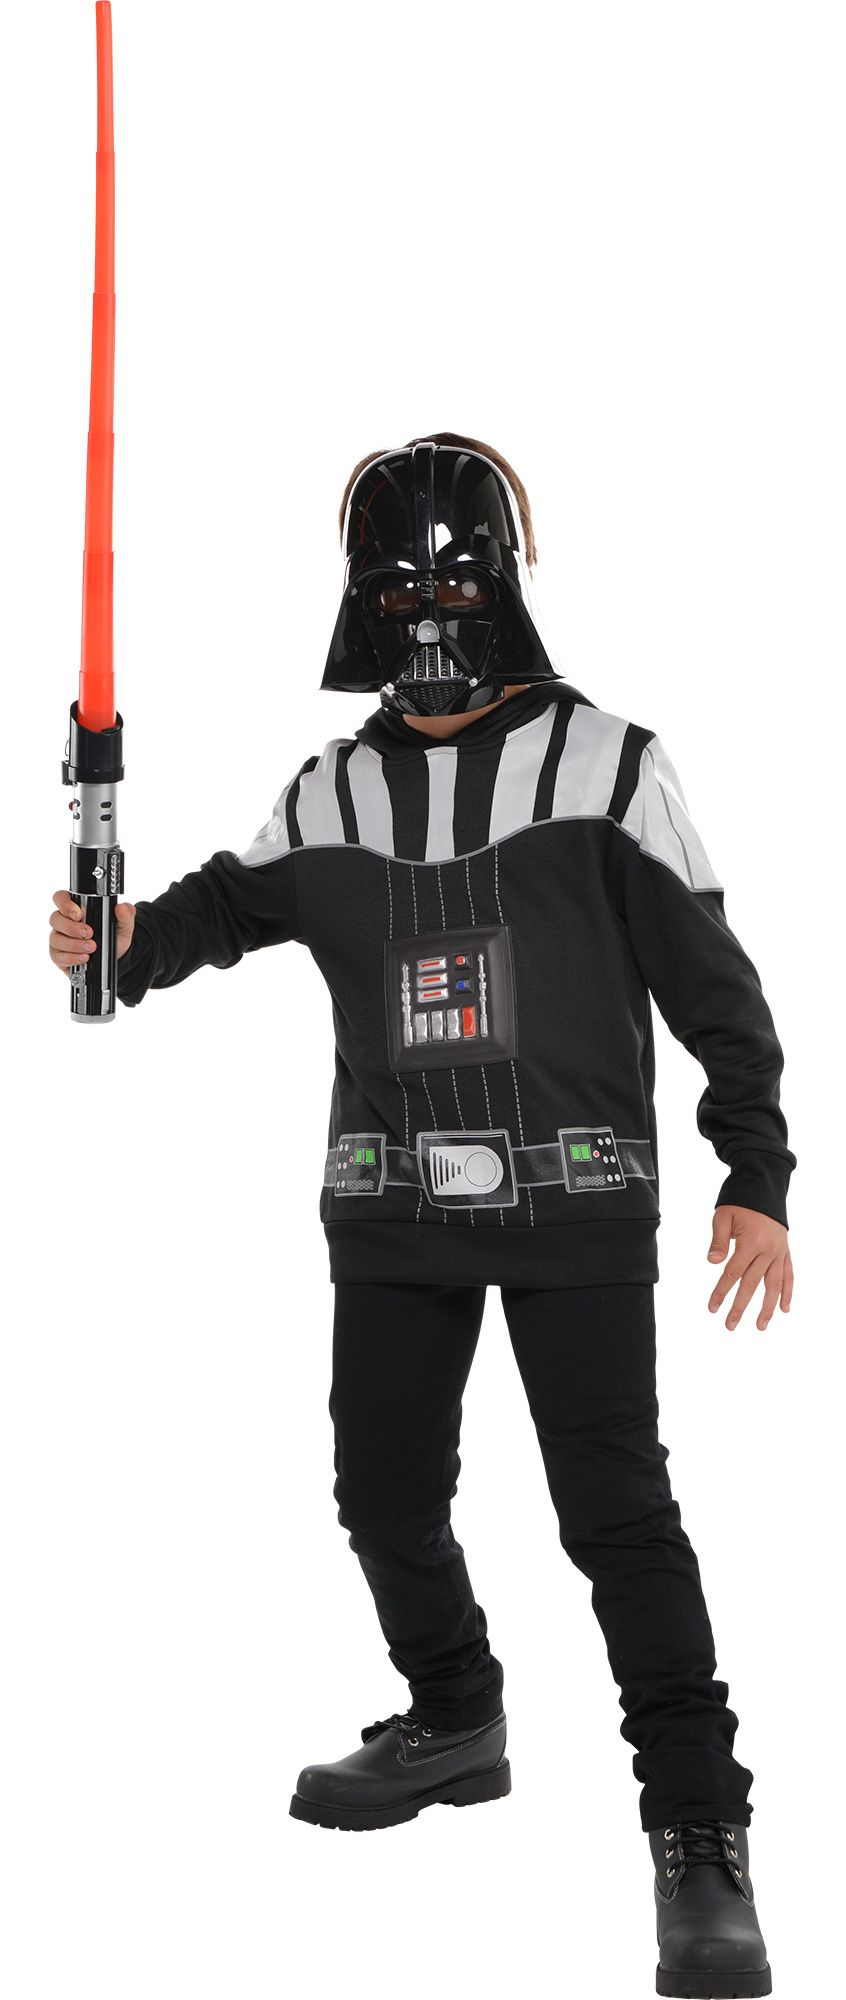 Make Your Costume - Boys Darth Vader